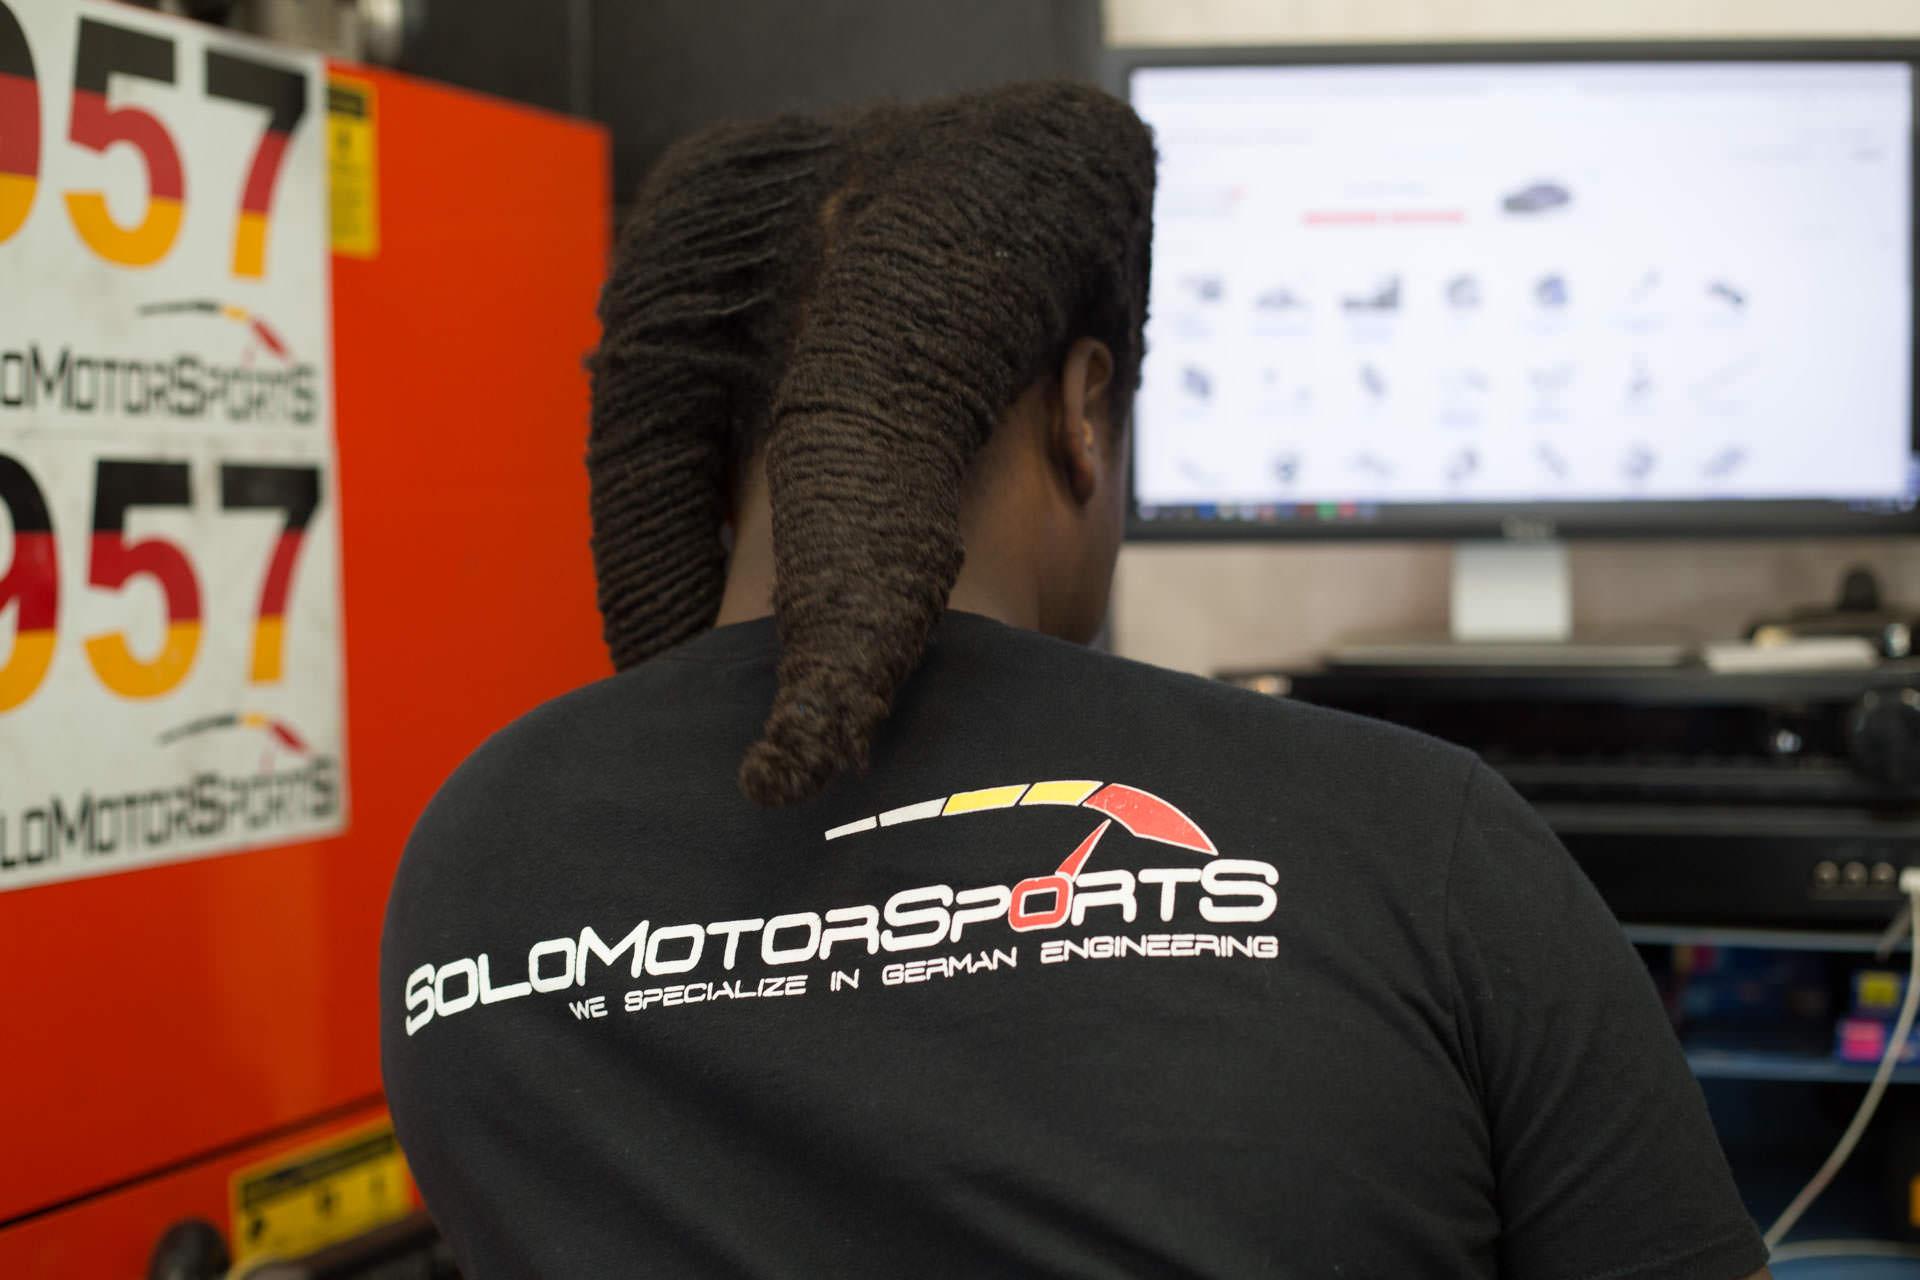 Solo Motorsports Dyno Tuning Exotics 17 Solo Motorsports